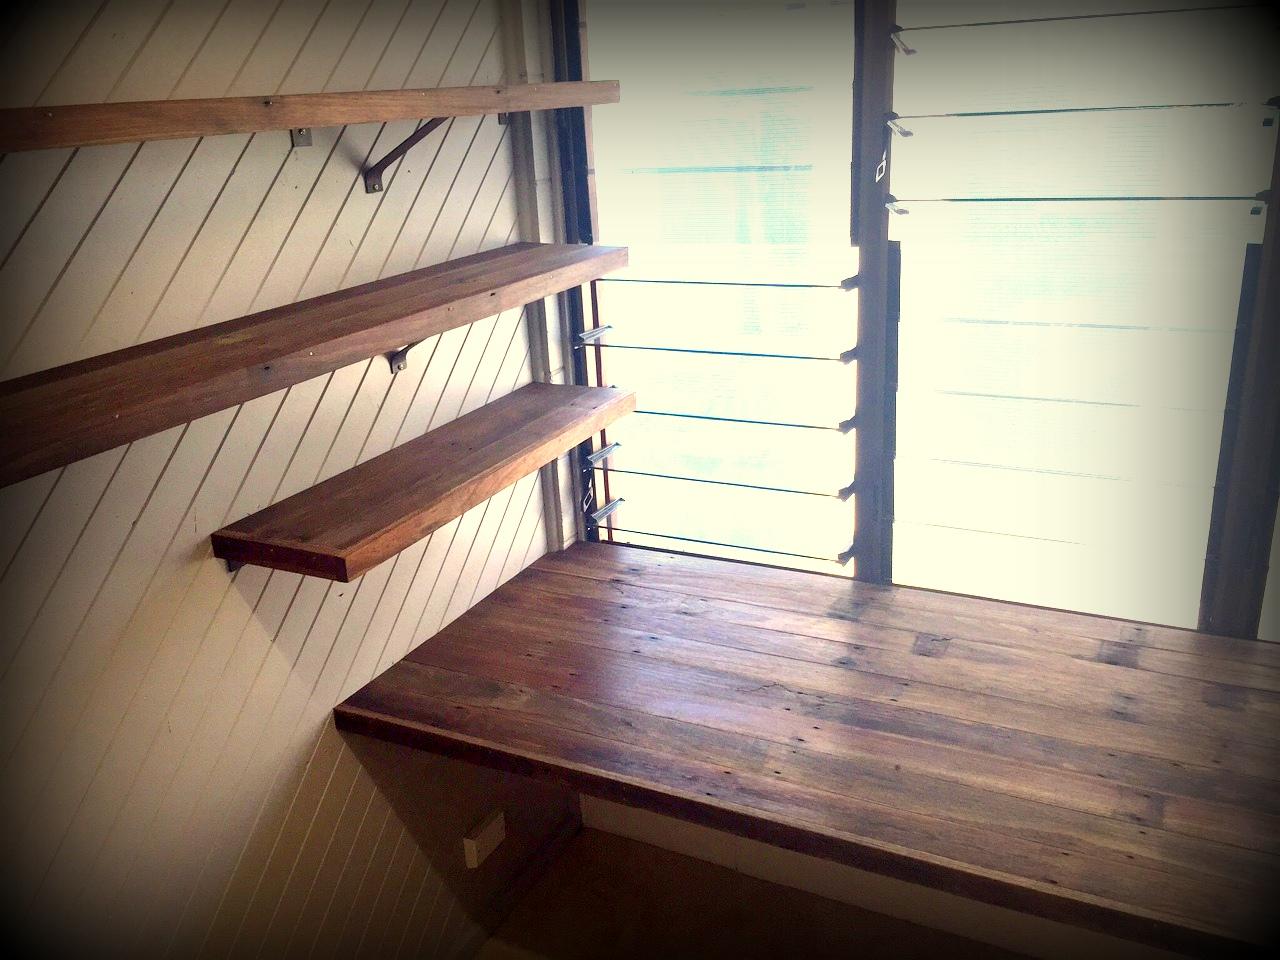 Floating Timber Desk and Shelves